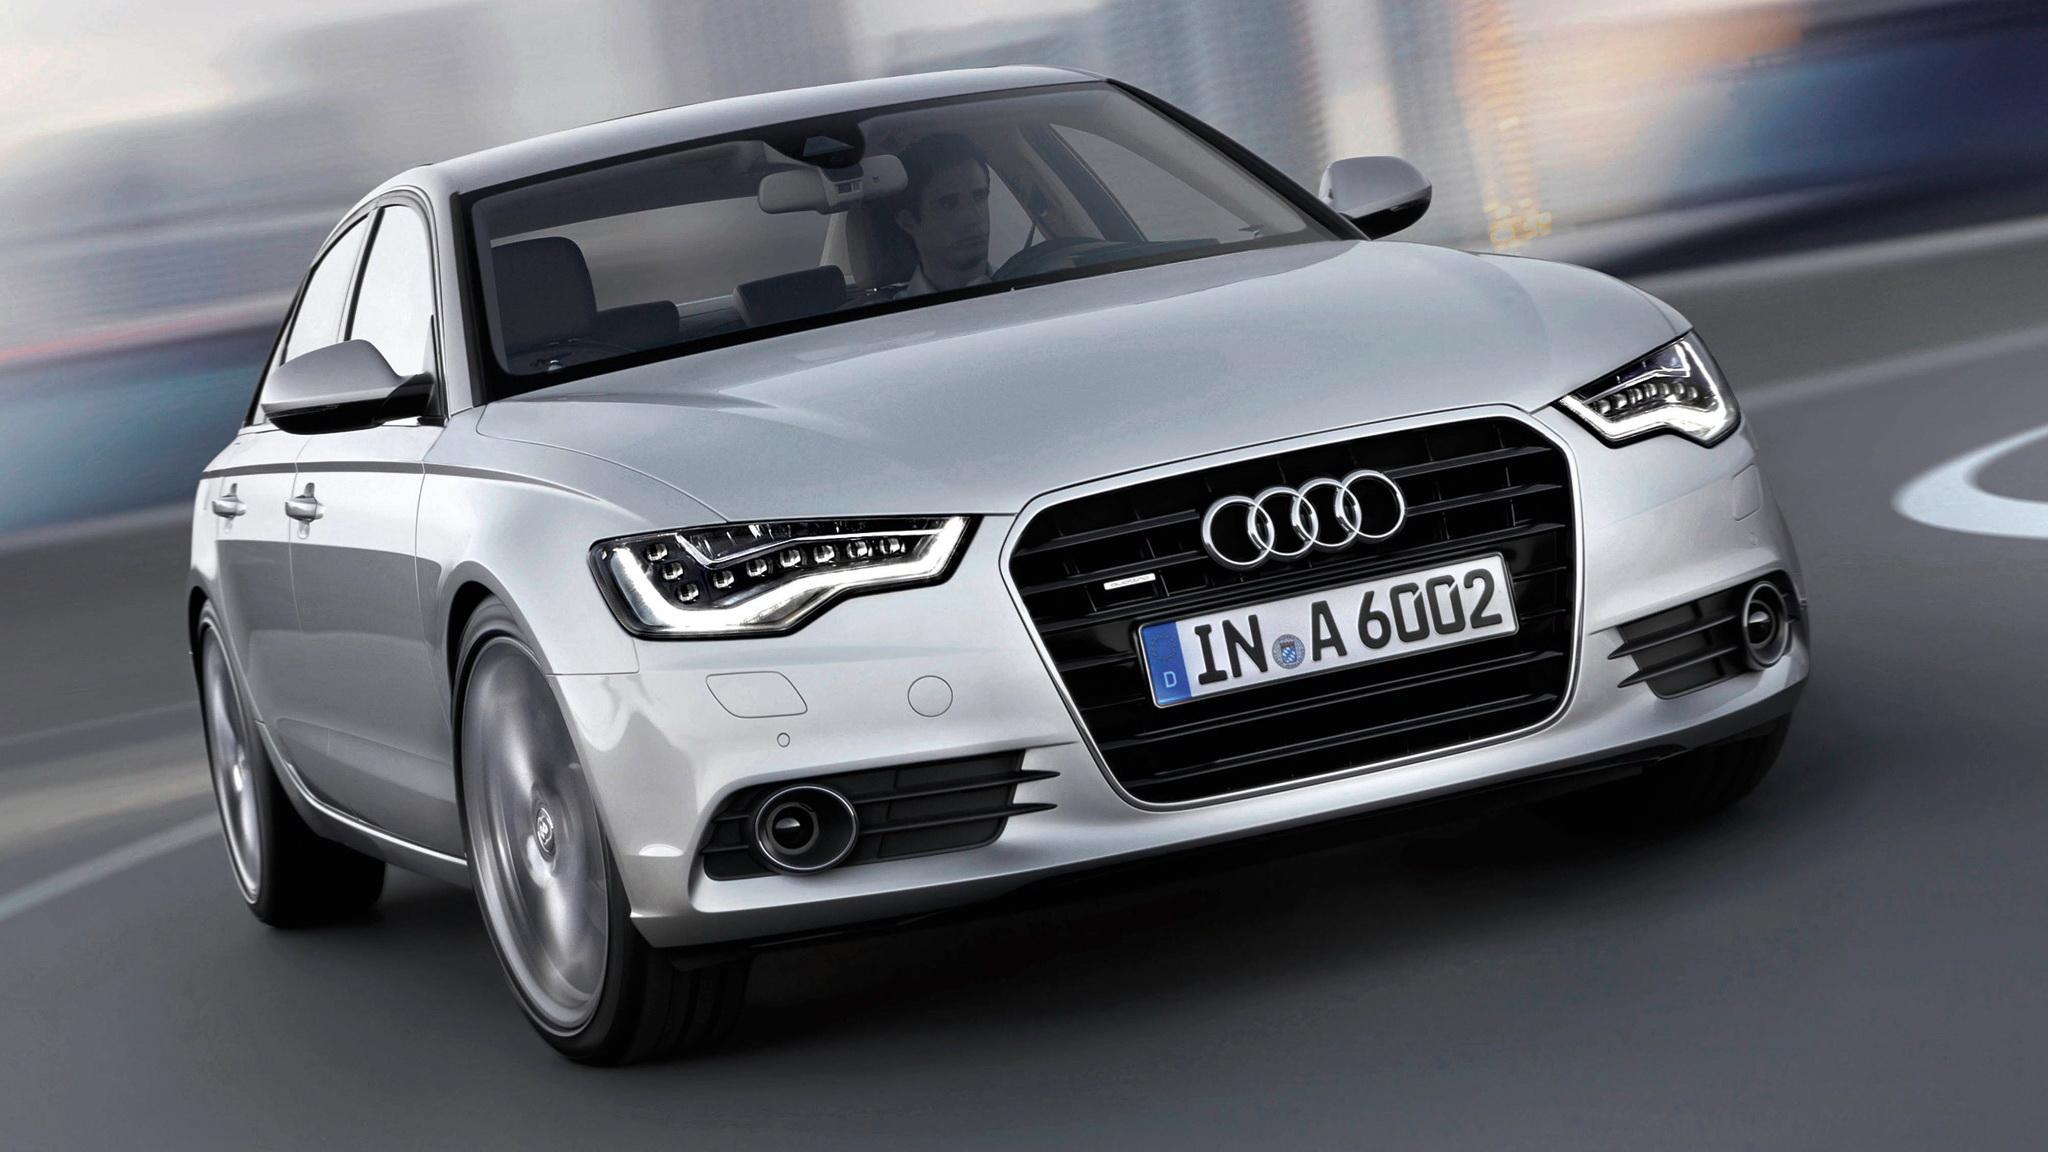 Audi A6 Présentation